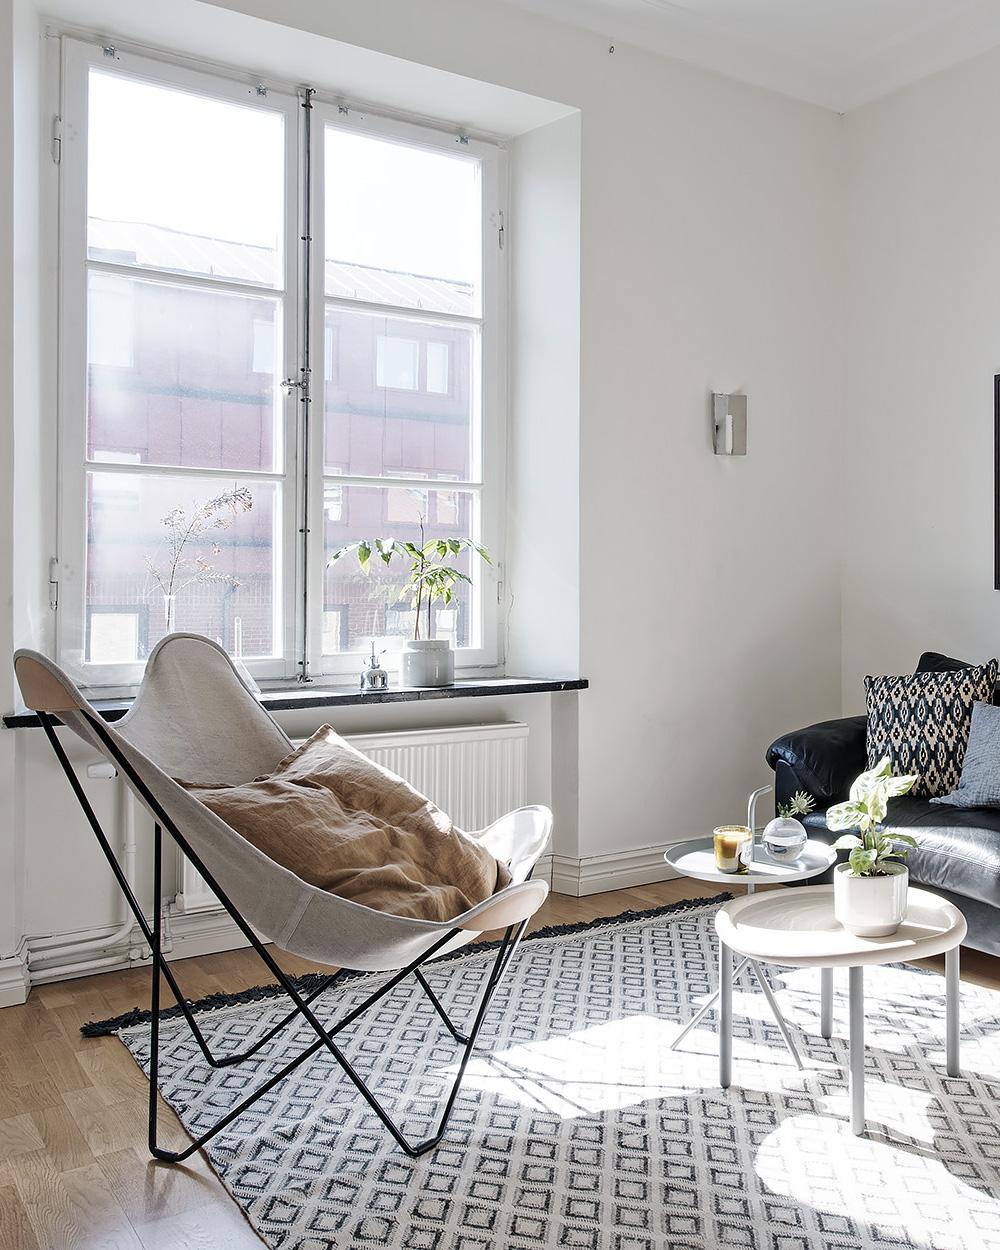 fauteuil deco salon scandinave